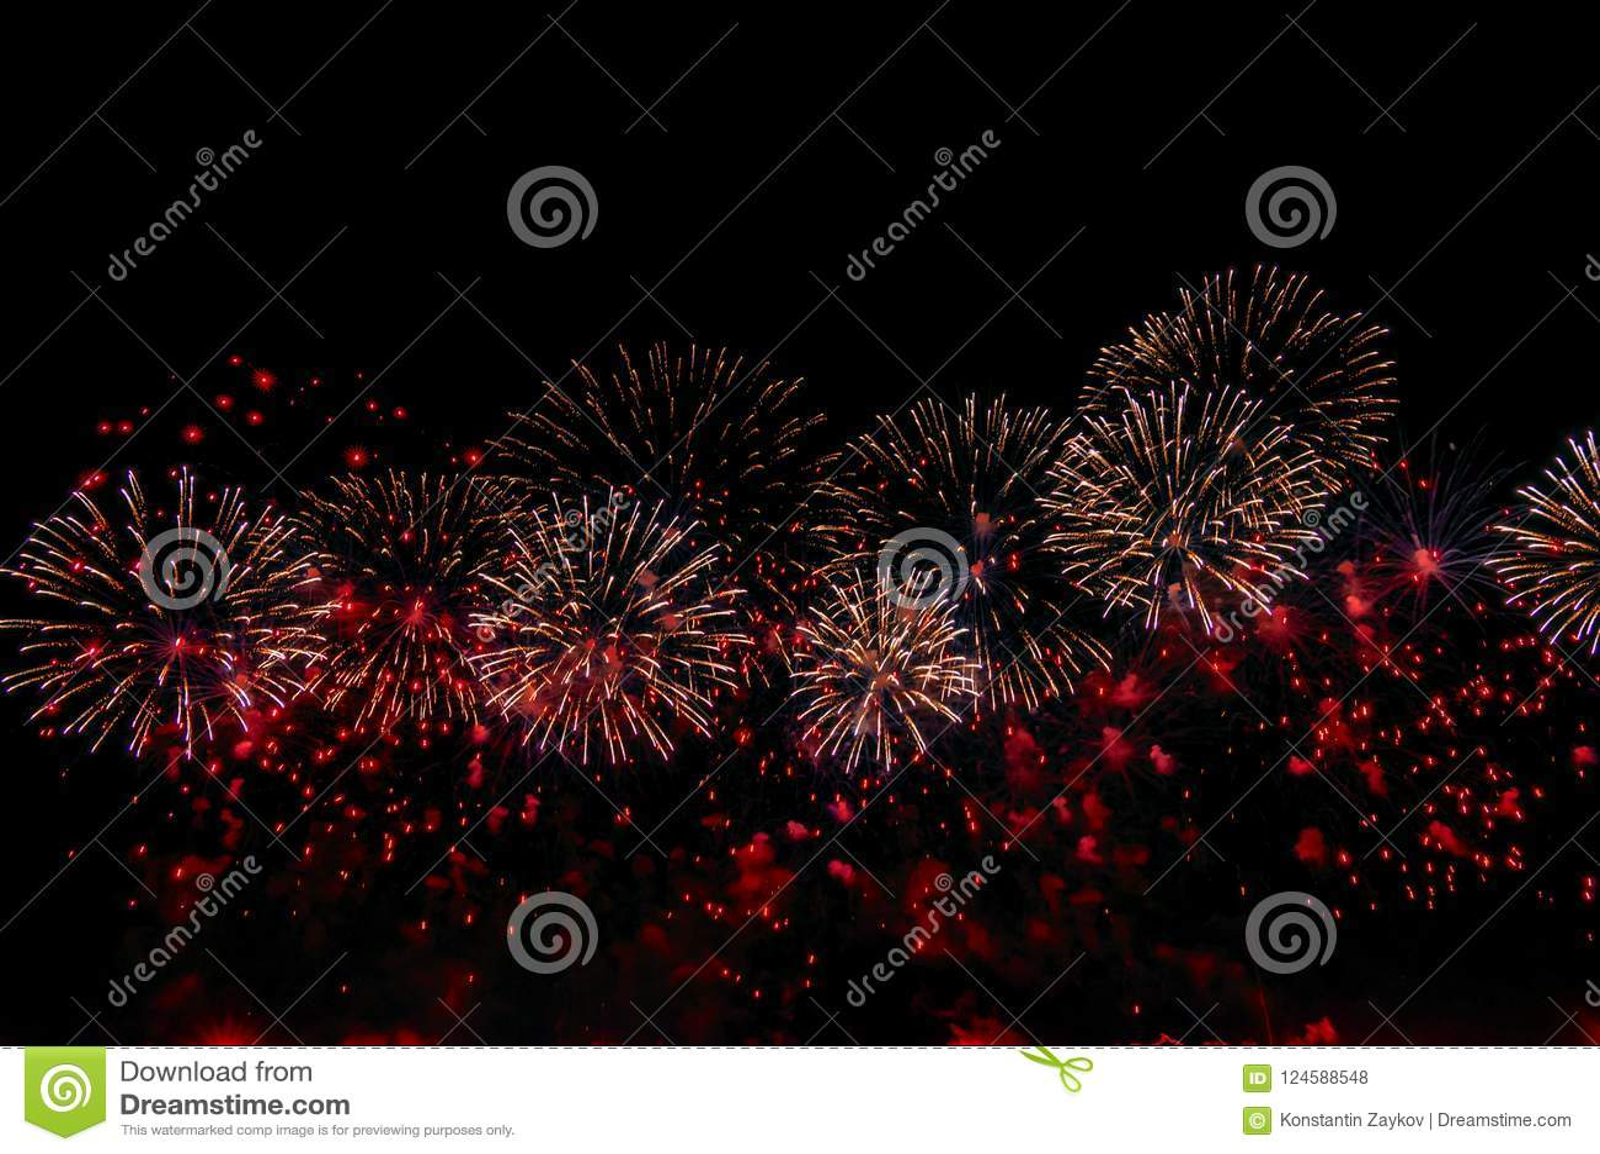 Fireworks on black background for celebration design. Abstract red firework display background.